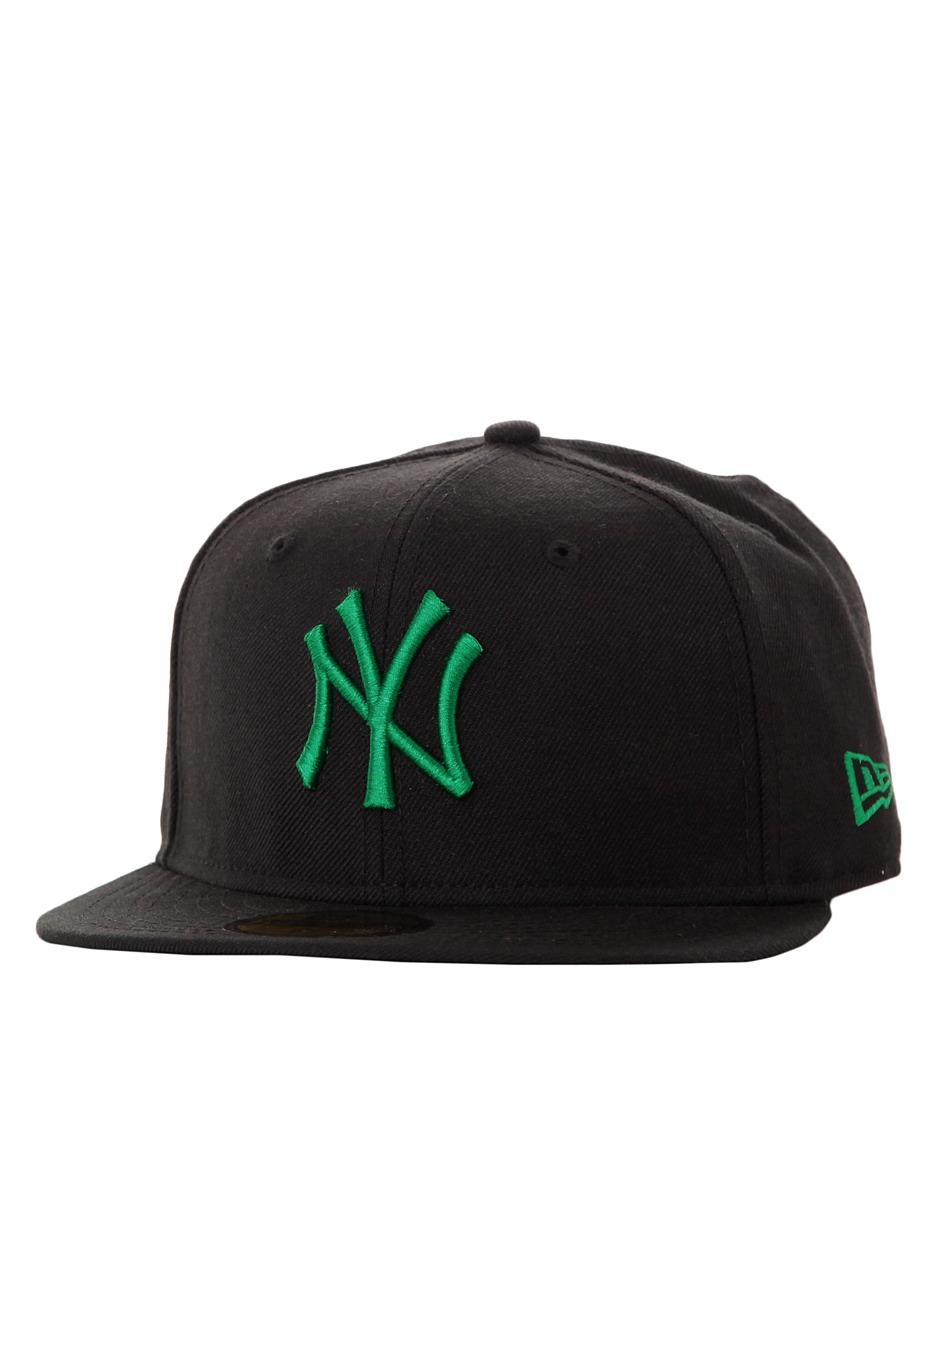 ... coupon code new era seasonal basic mlb new york yankees black green cap  streetwear shop impericon e96c4c4315